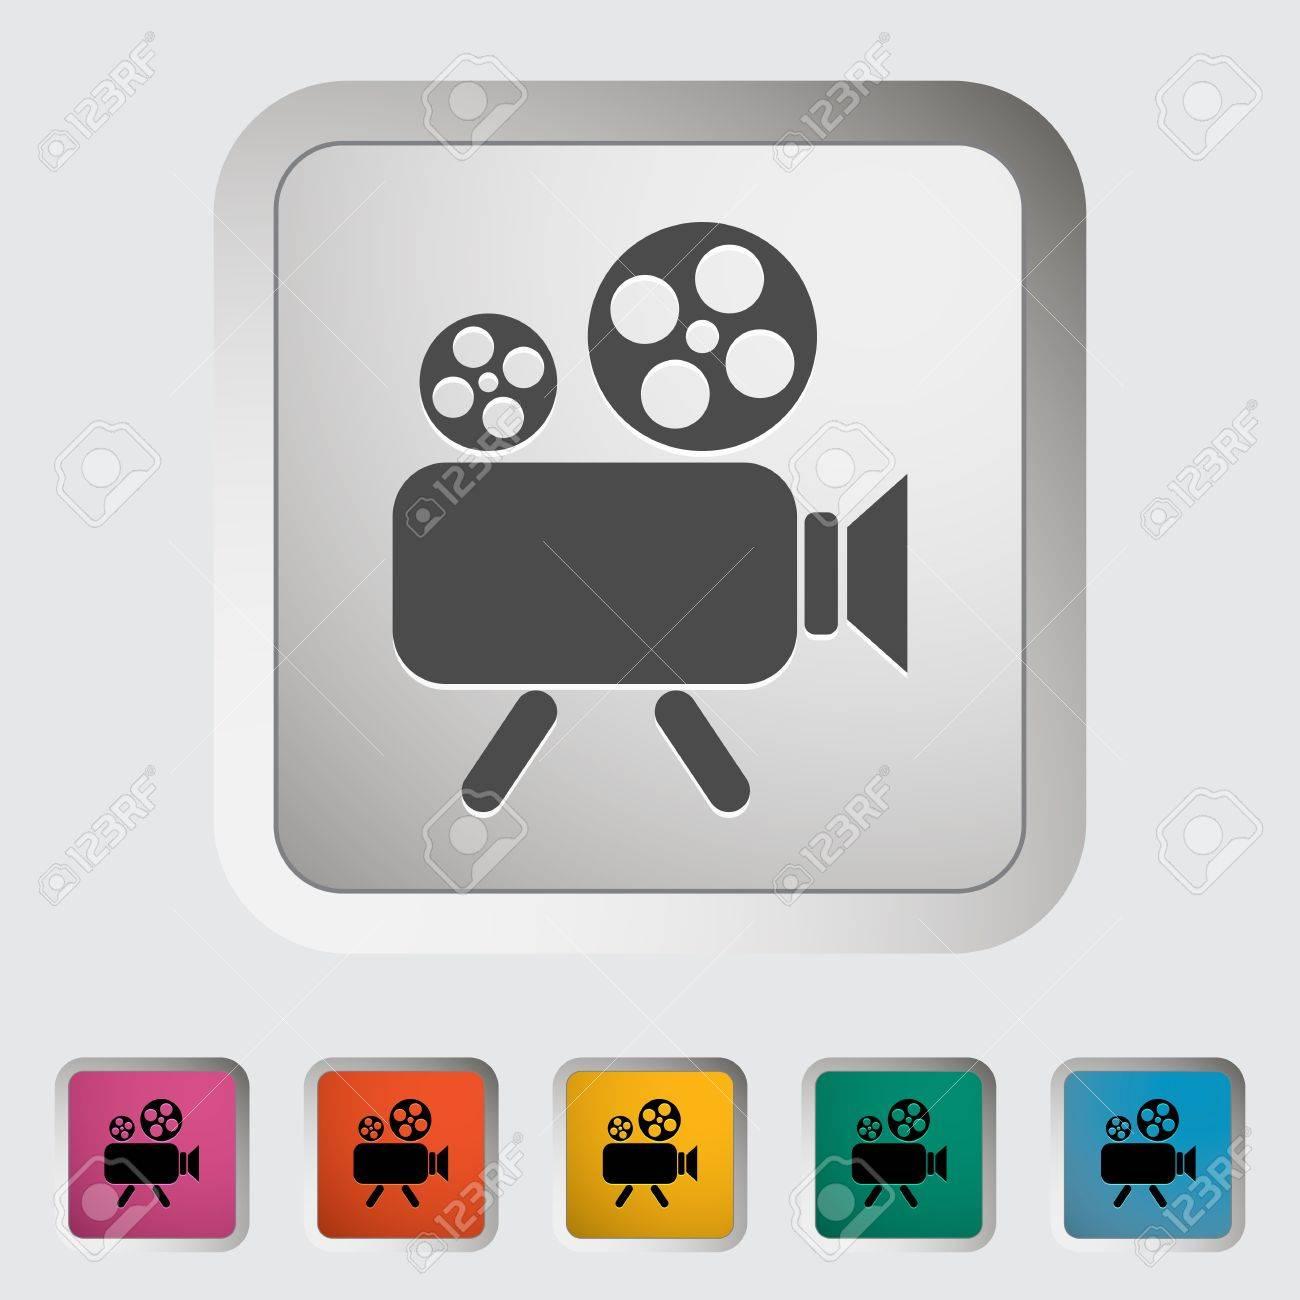 Videocamera. Single icon. Vector illustration. Stock Vector - 19210817